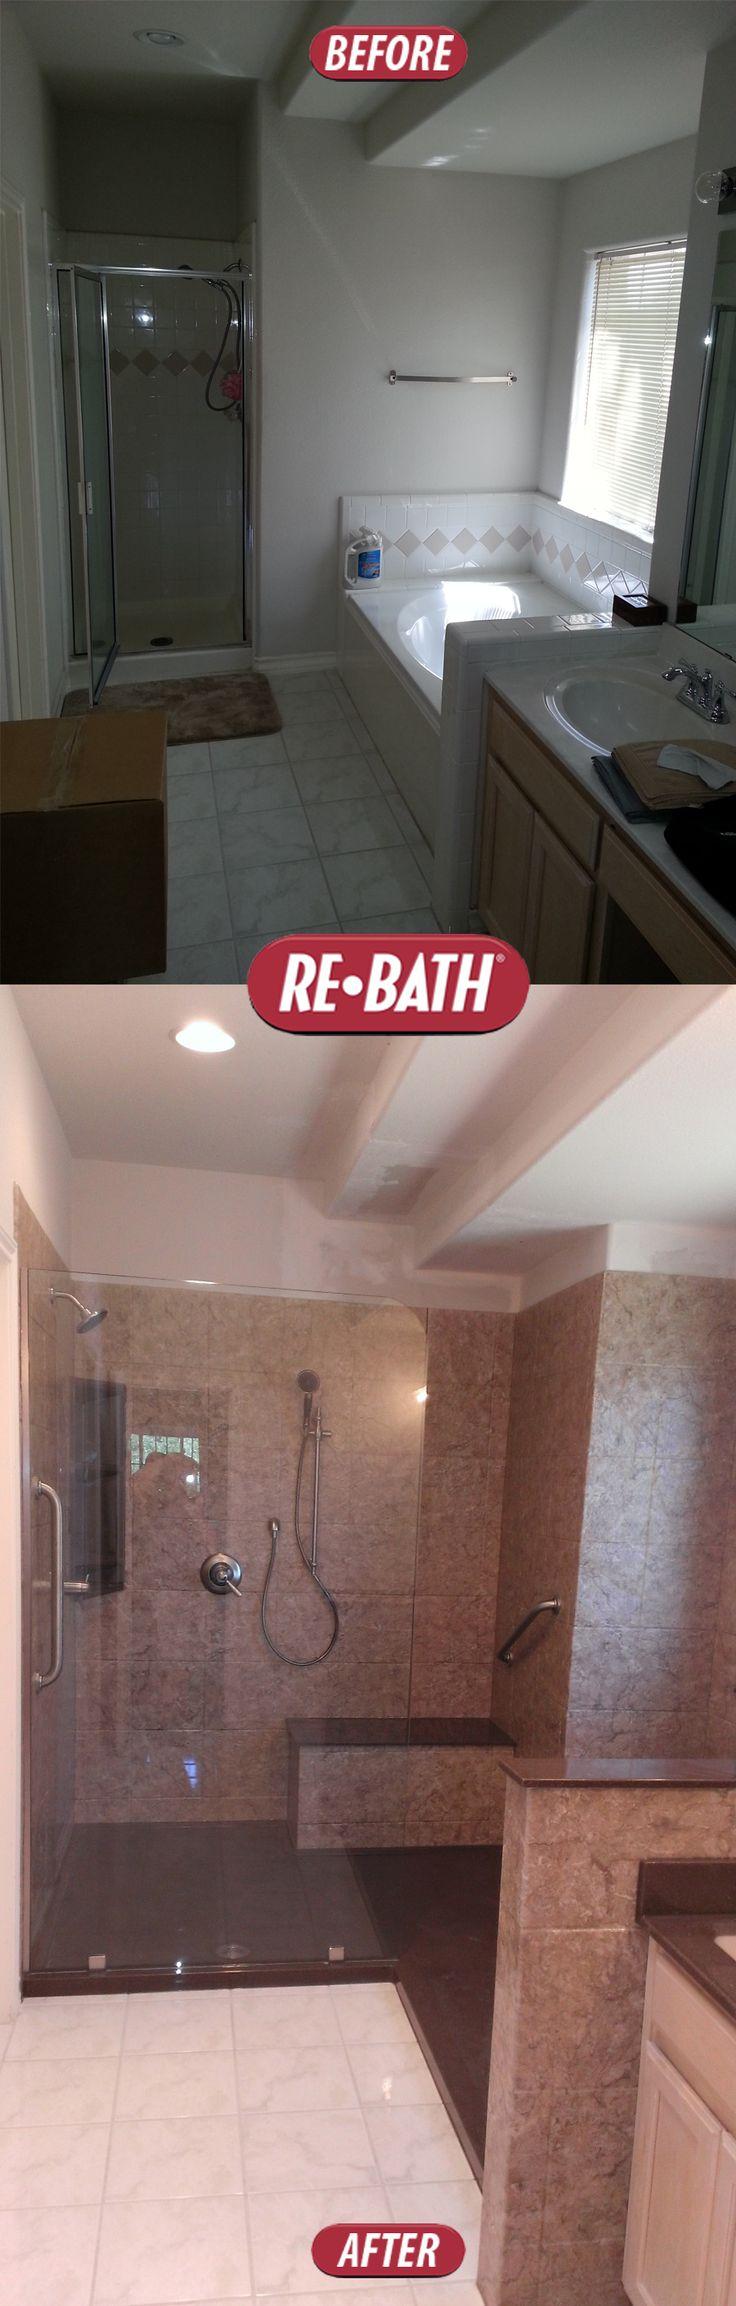 Austin Bathroom Remodeling Ideas Stunning Decorating Design